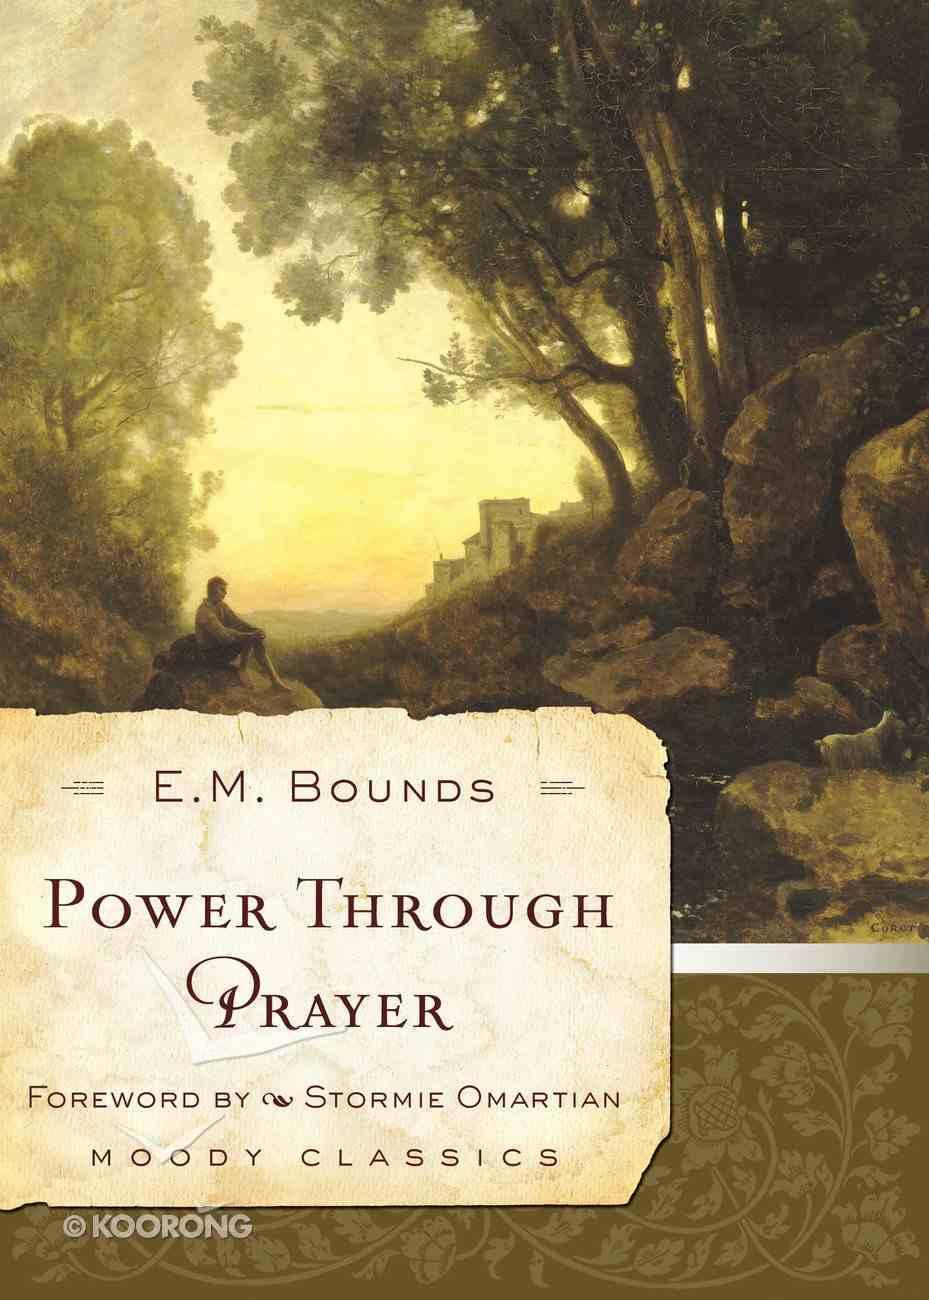 Mlcs: Power Through Prayer (Moody Classic Series) eBook